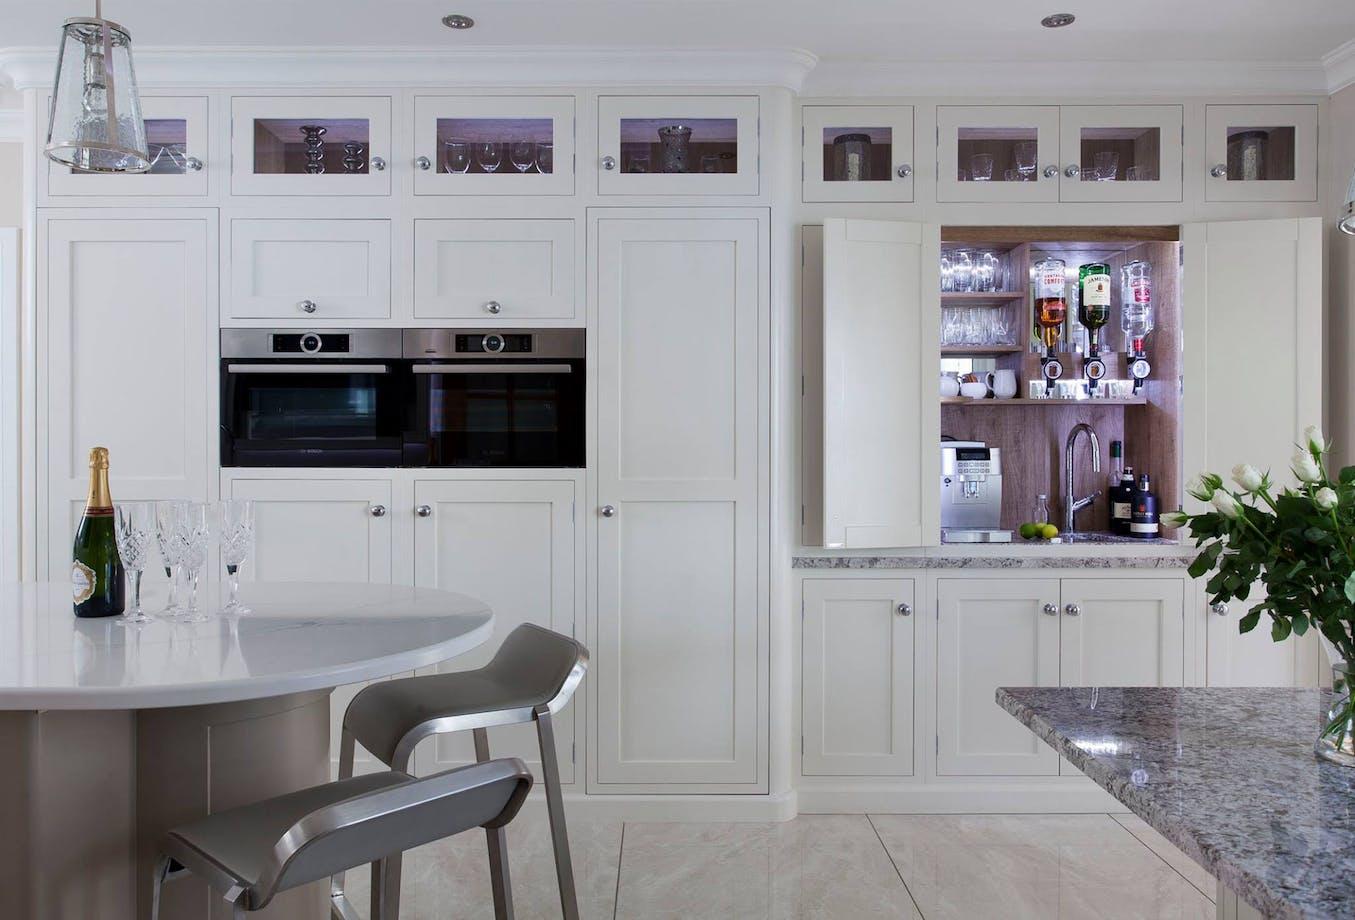 Wrights Design House - Calacatta Gold